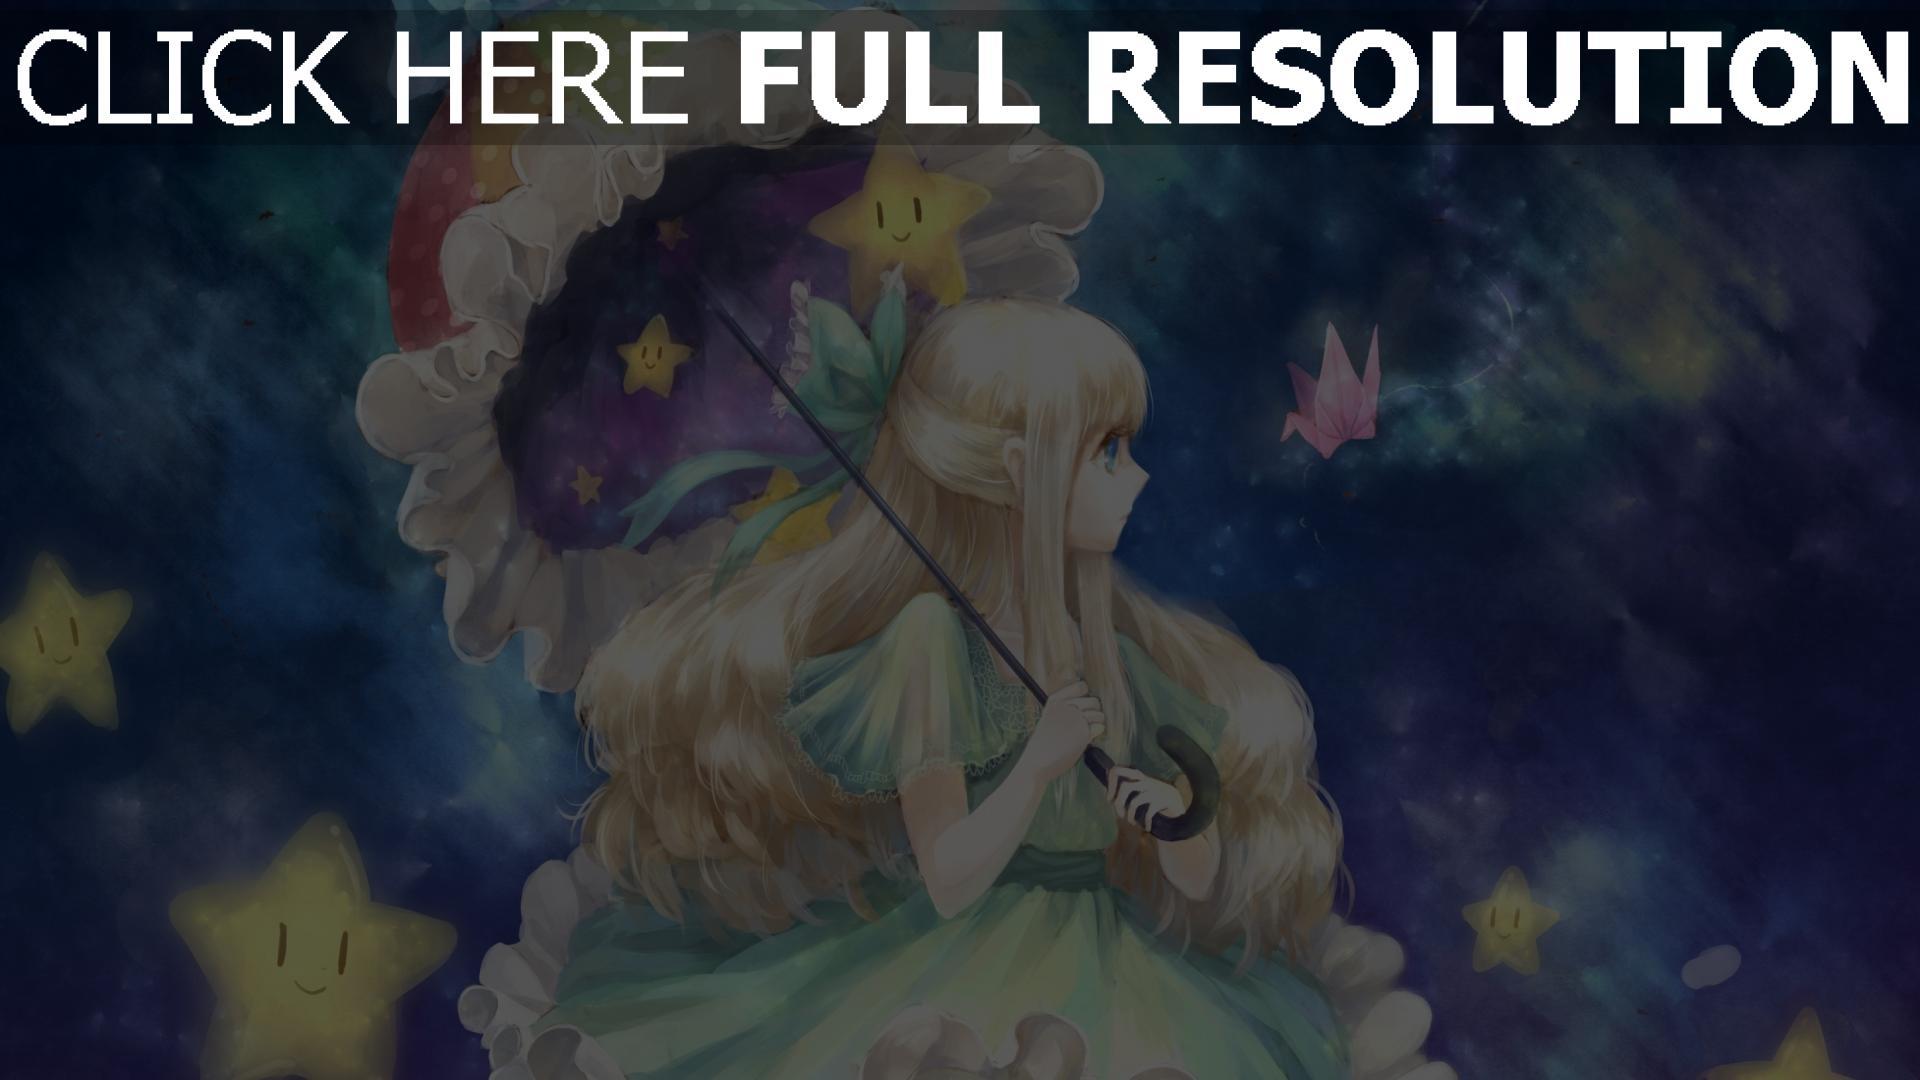 Hd hintergrundbilder m dchen regenschirm sterne art - Wallpaper anime hp ...